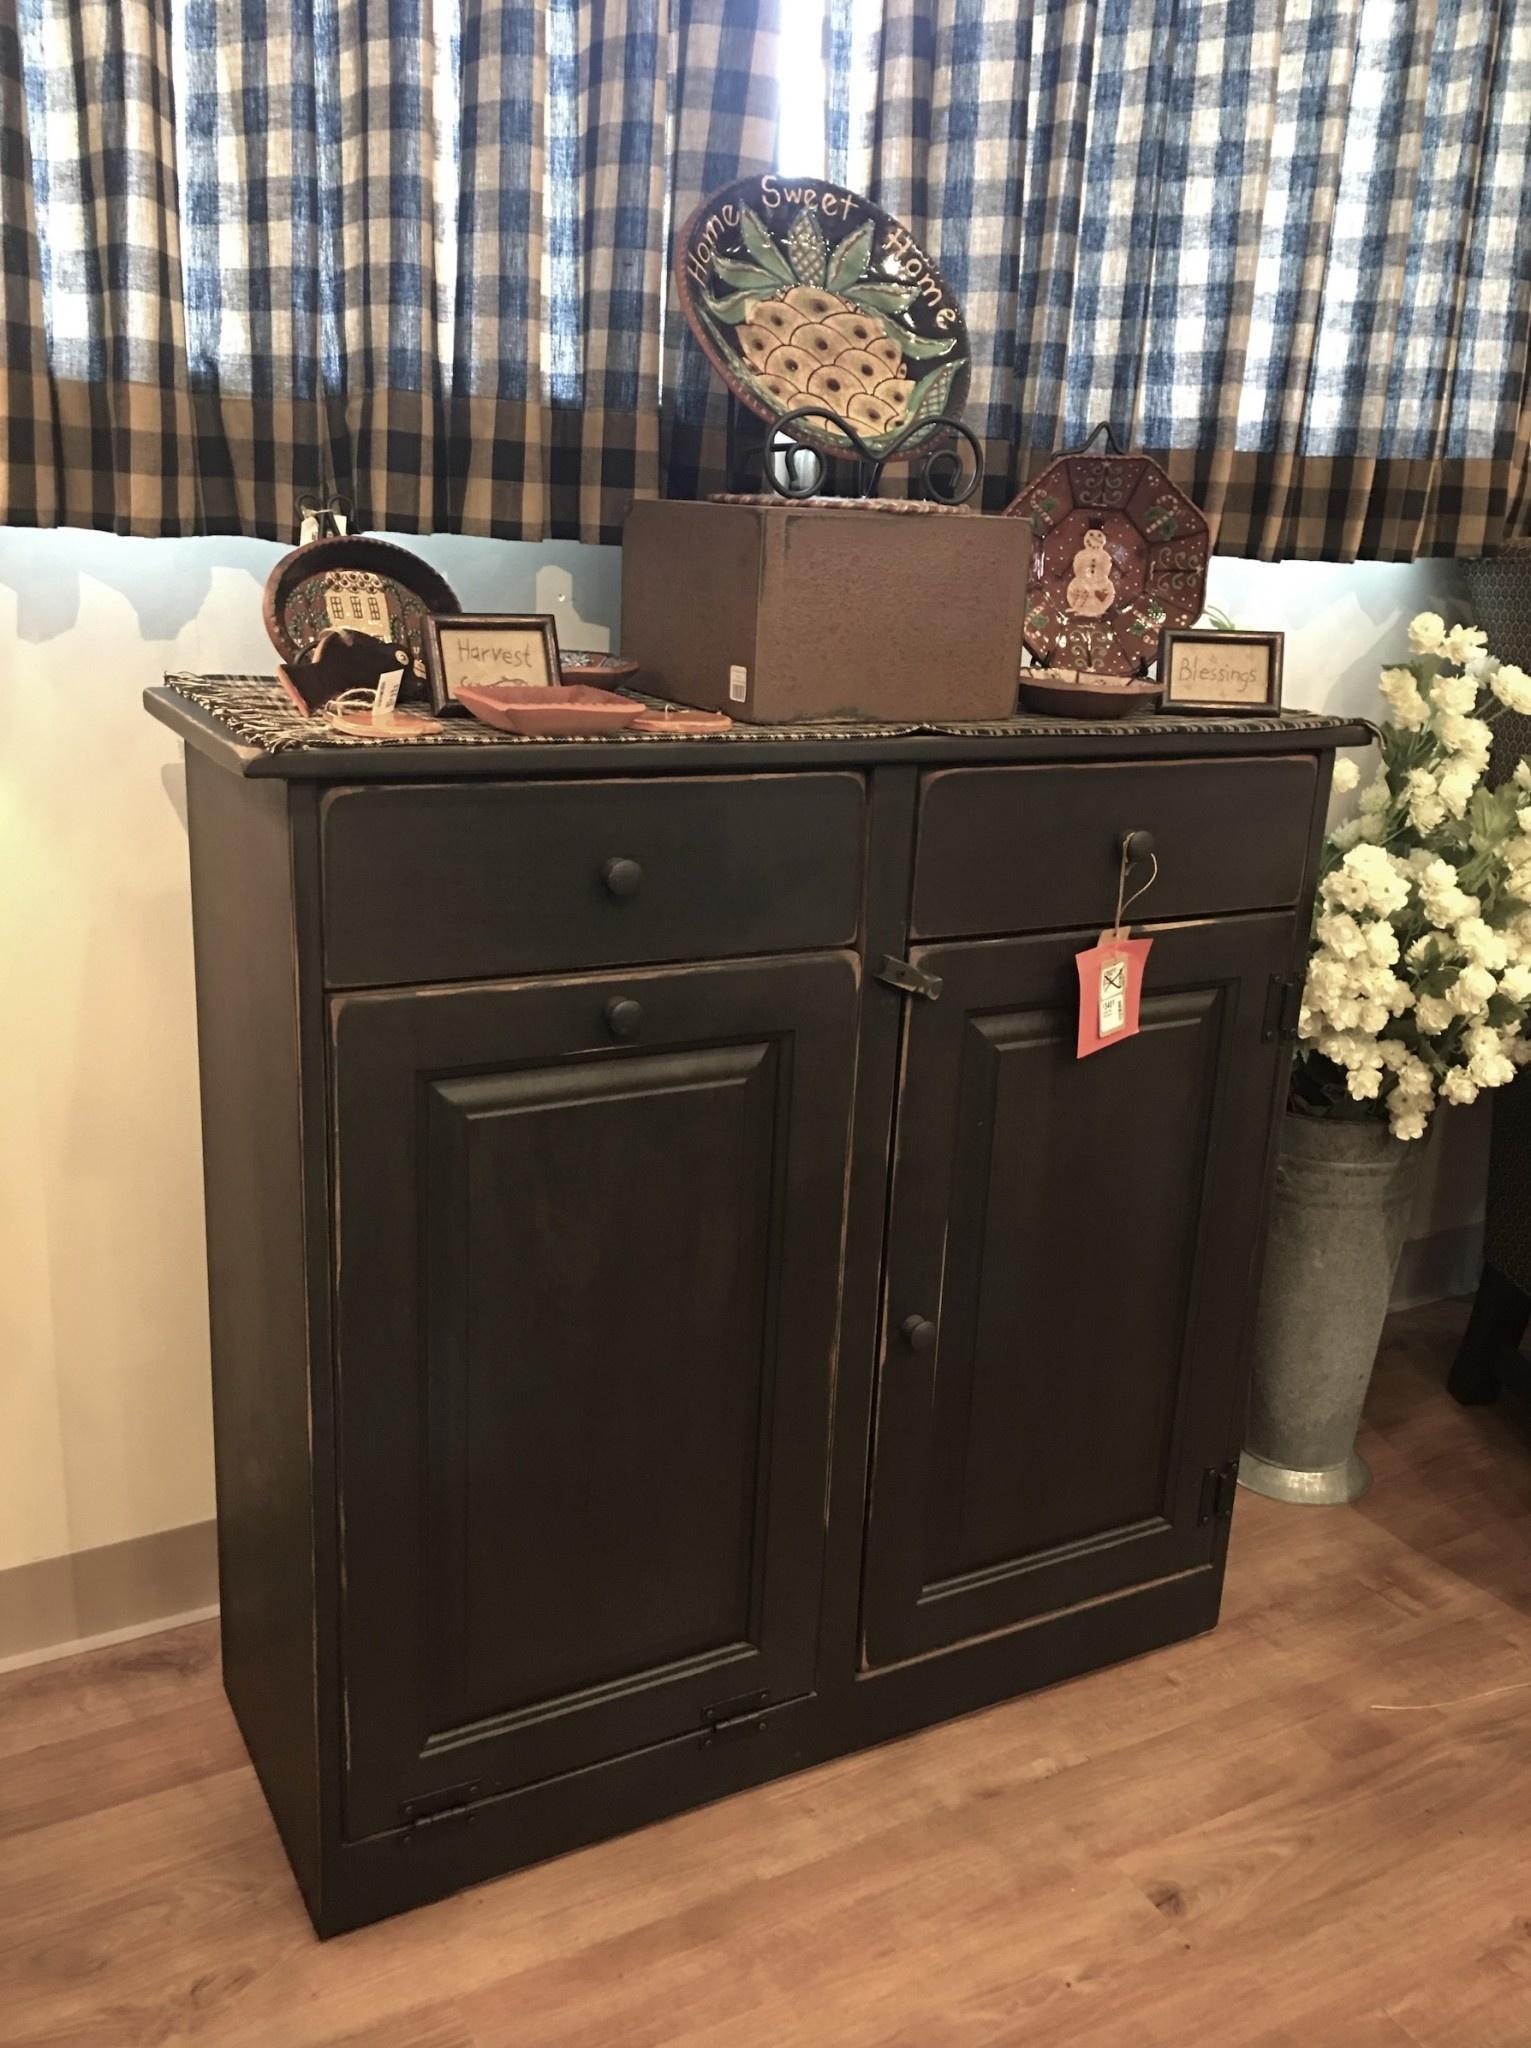 Stupendous Coffee Bar Cabinet Country Primitive Furniture Nanas Farmhouse Home Interior And Landscaping Transignezvosmurscom